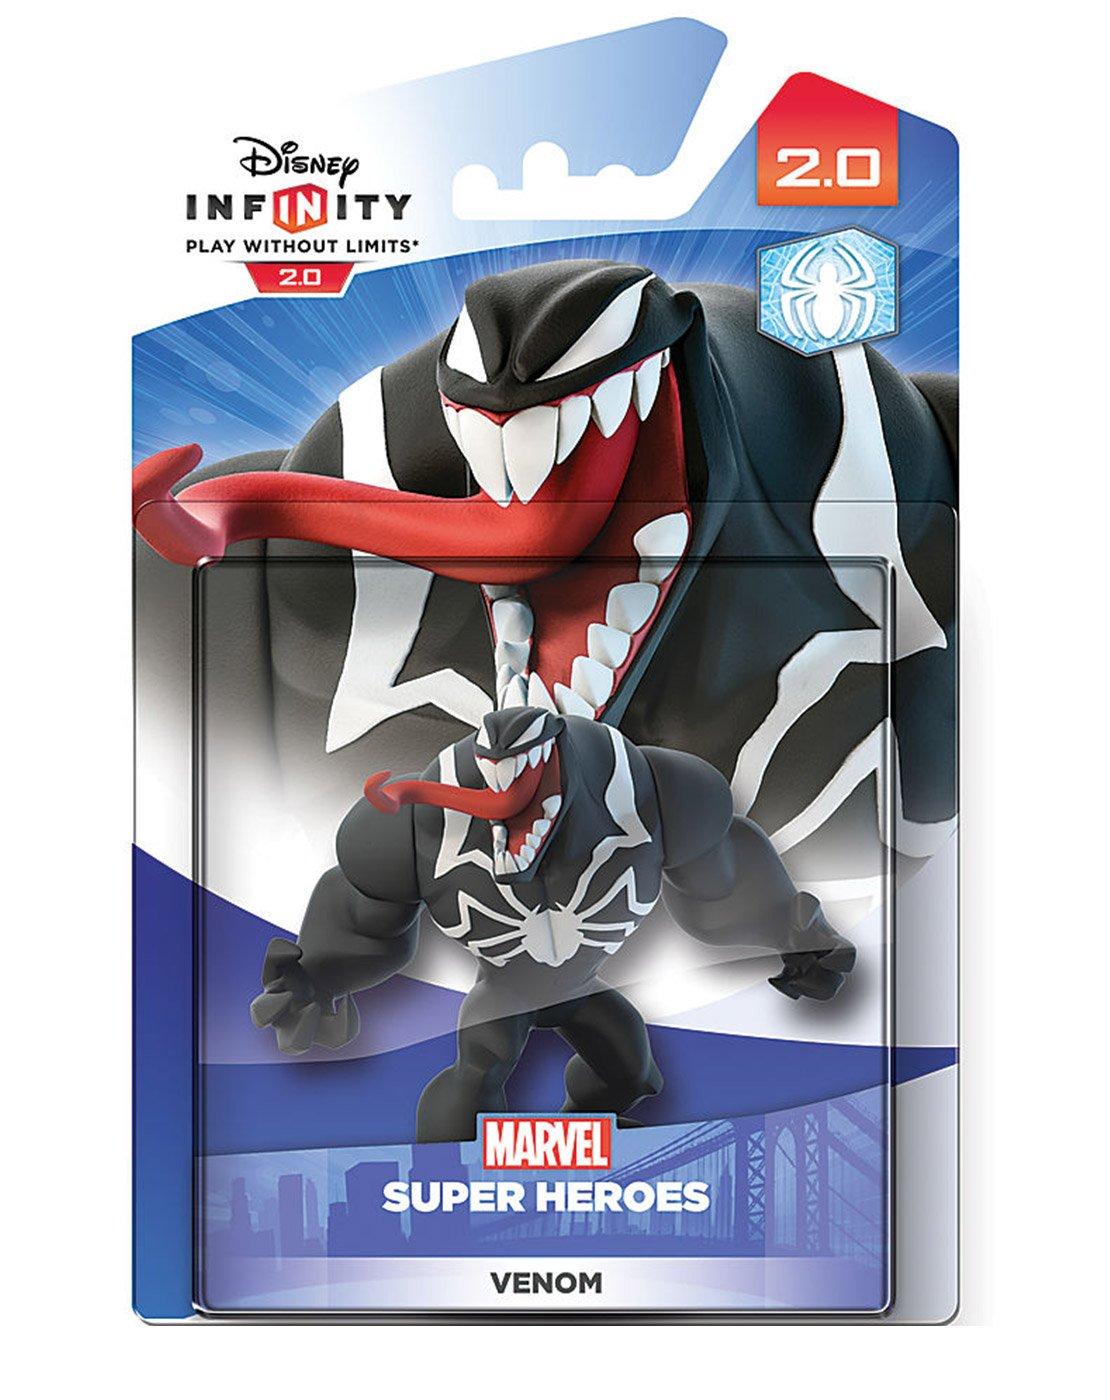 infinity 2 0 ps4. amazon.com: disney infinity 2.0 character - venom figure (ps4/ps3/nintendo wii u/xbox 360/xbox one) (uk import): toys \u0026 games 2 0 ps4